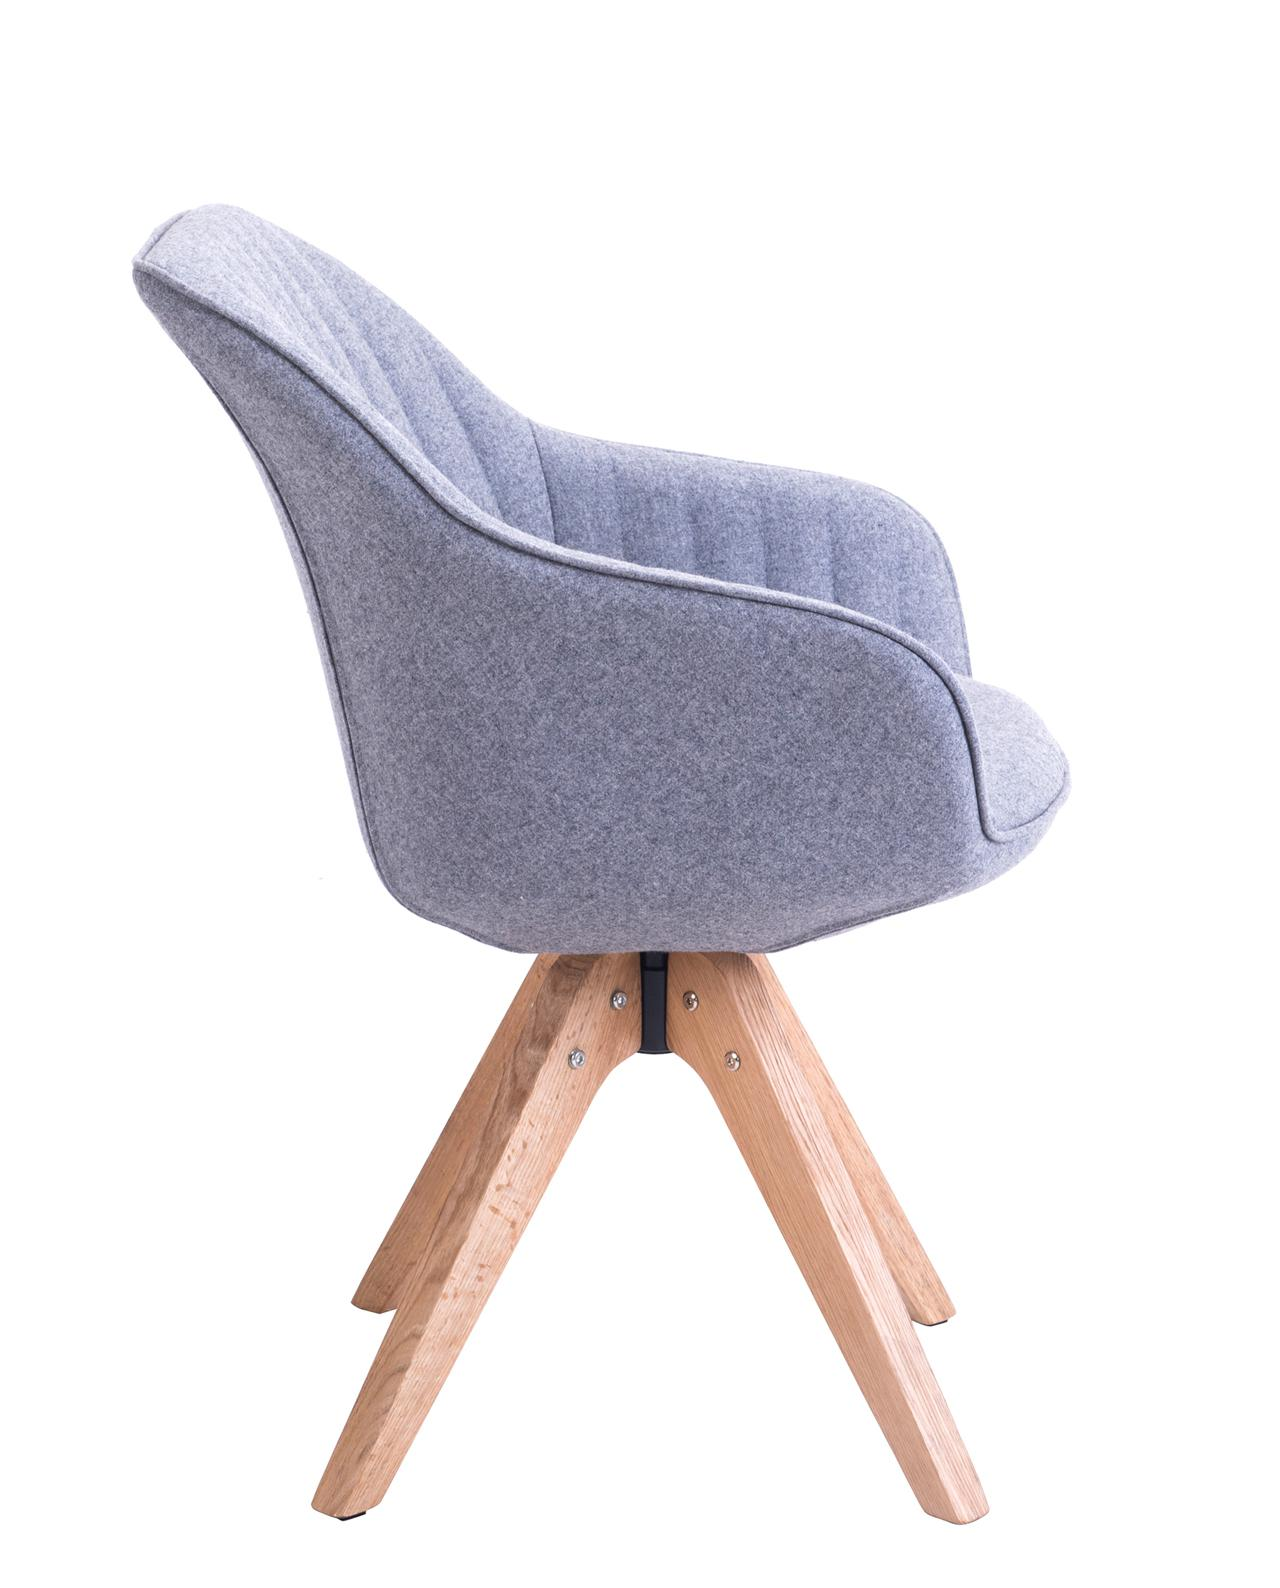 chaise design scandinave pivotante dune. Black Bedroom Furniture Sets. Home Design Ideas